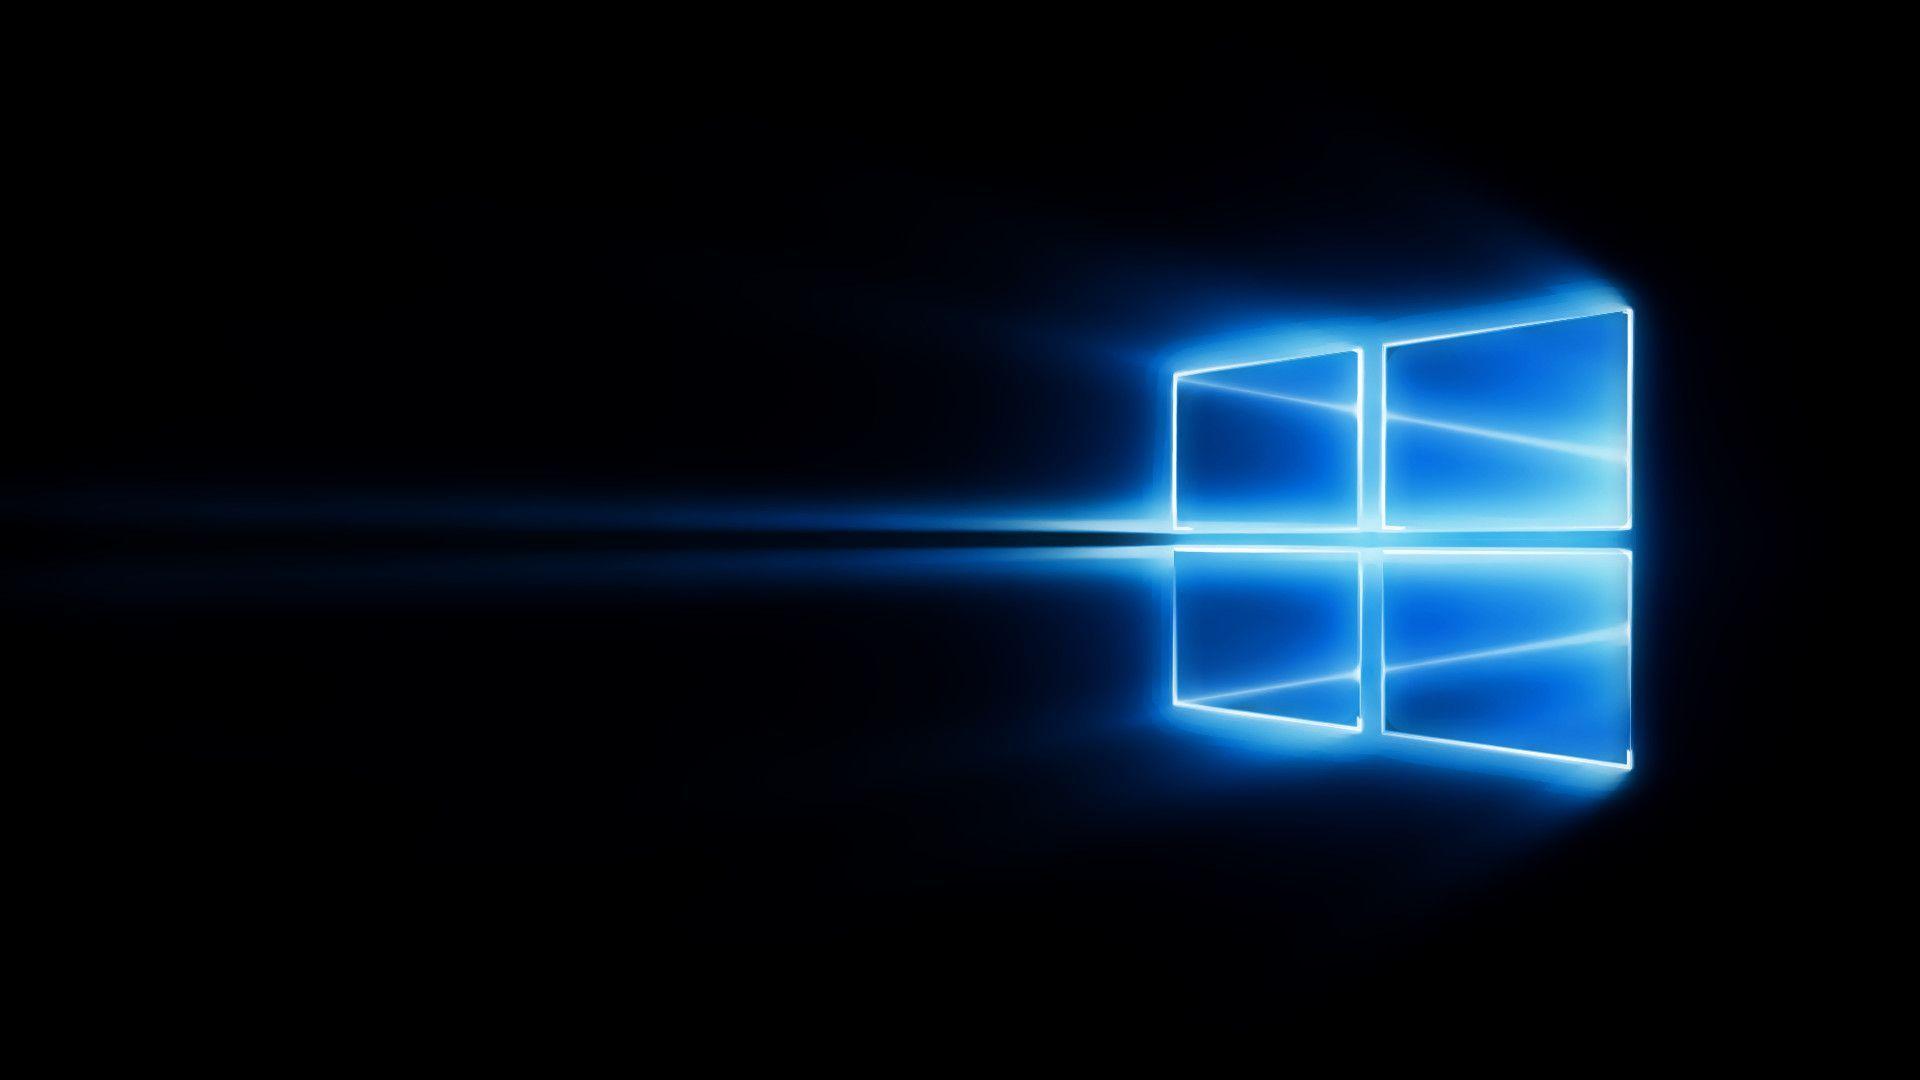 Windows 10 Wallpaper Hd 1 Windows 10 Siyah Duvar Kagidi Arkaplan Tasarimlari